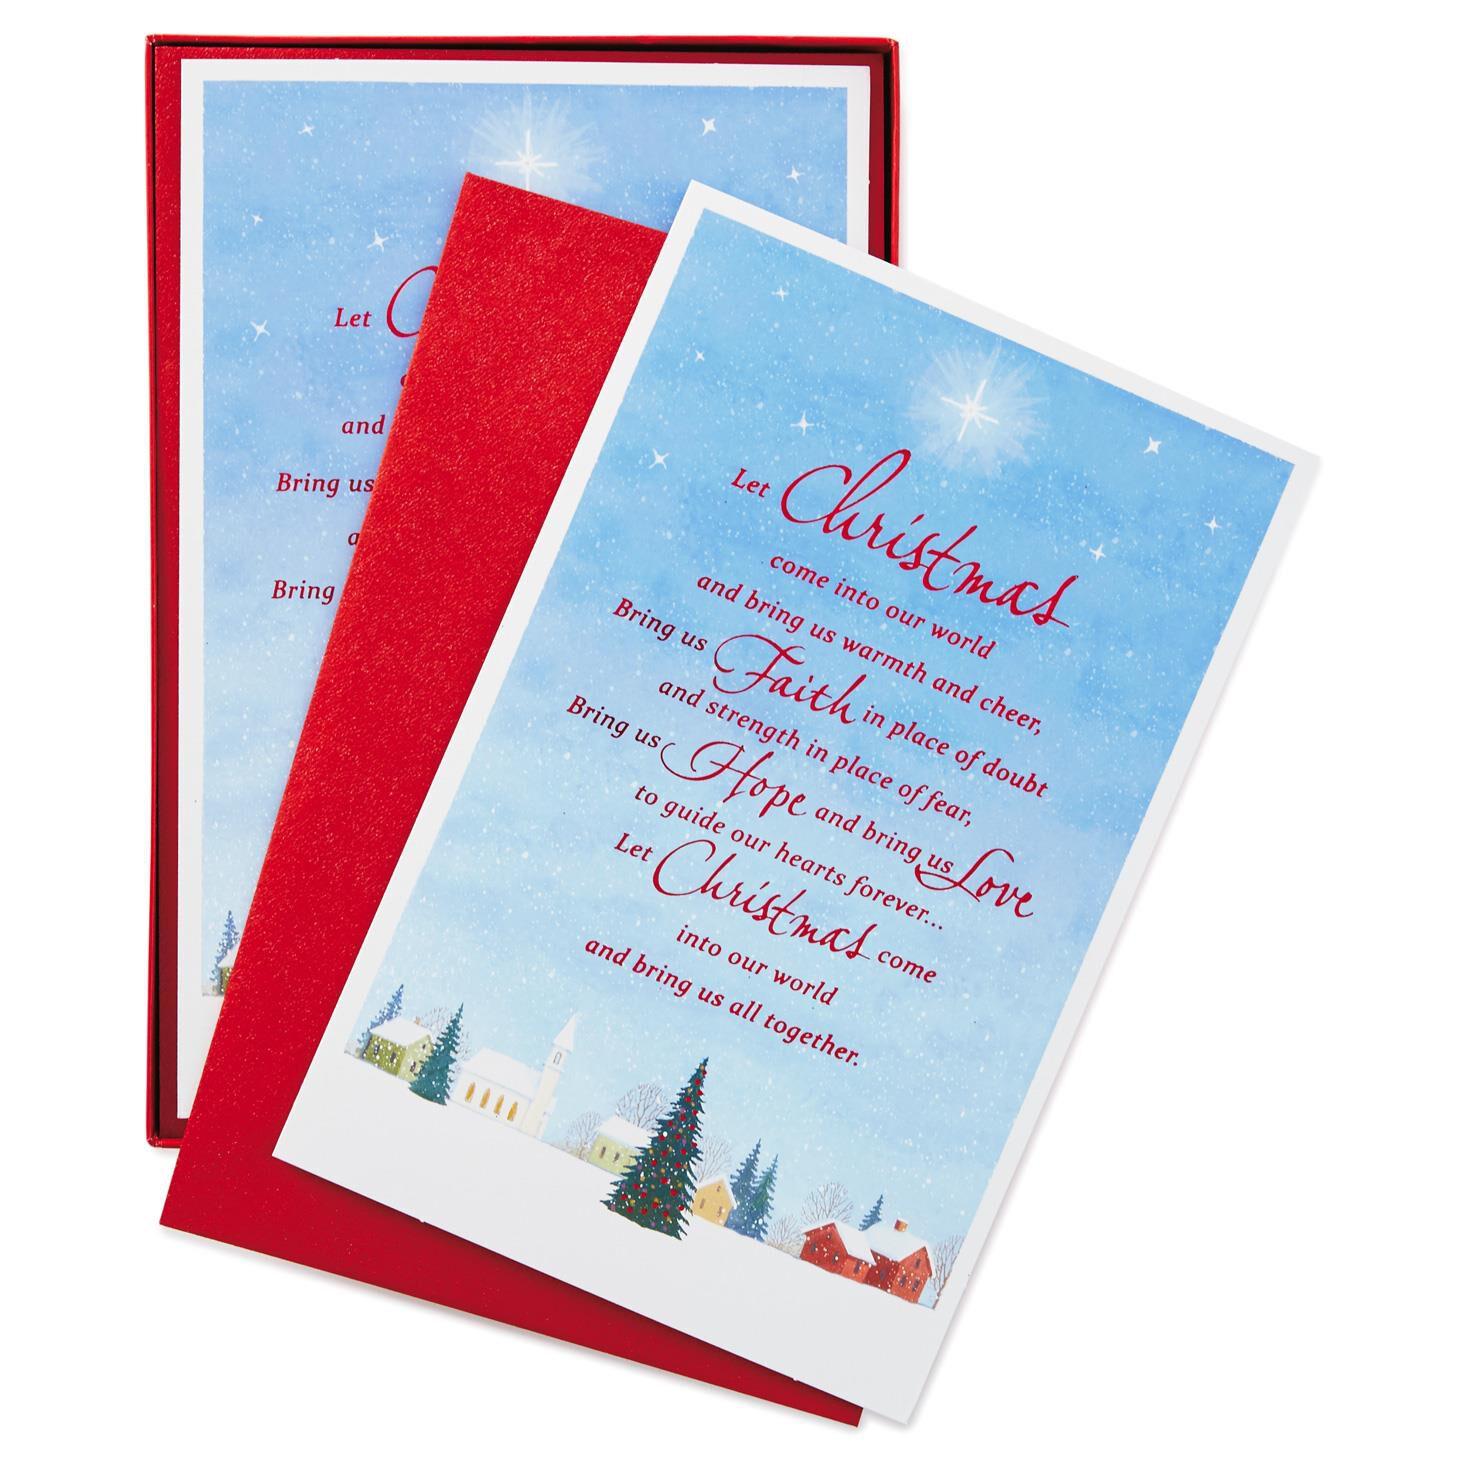 Hallmark Christmas Cards.Warmth And Cheer Christmas Cards Box Of 40